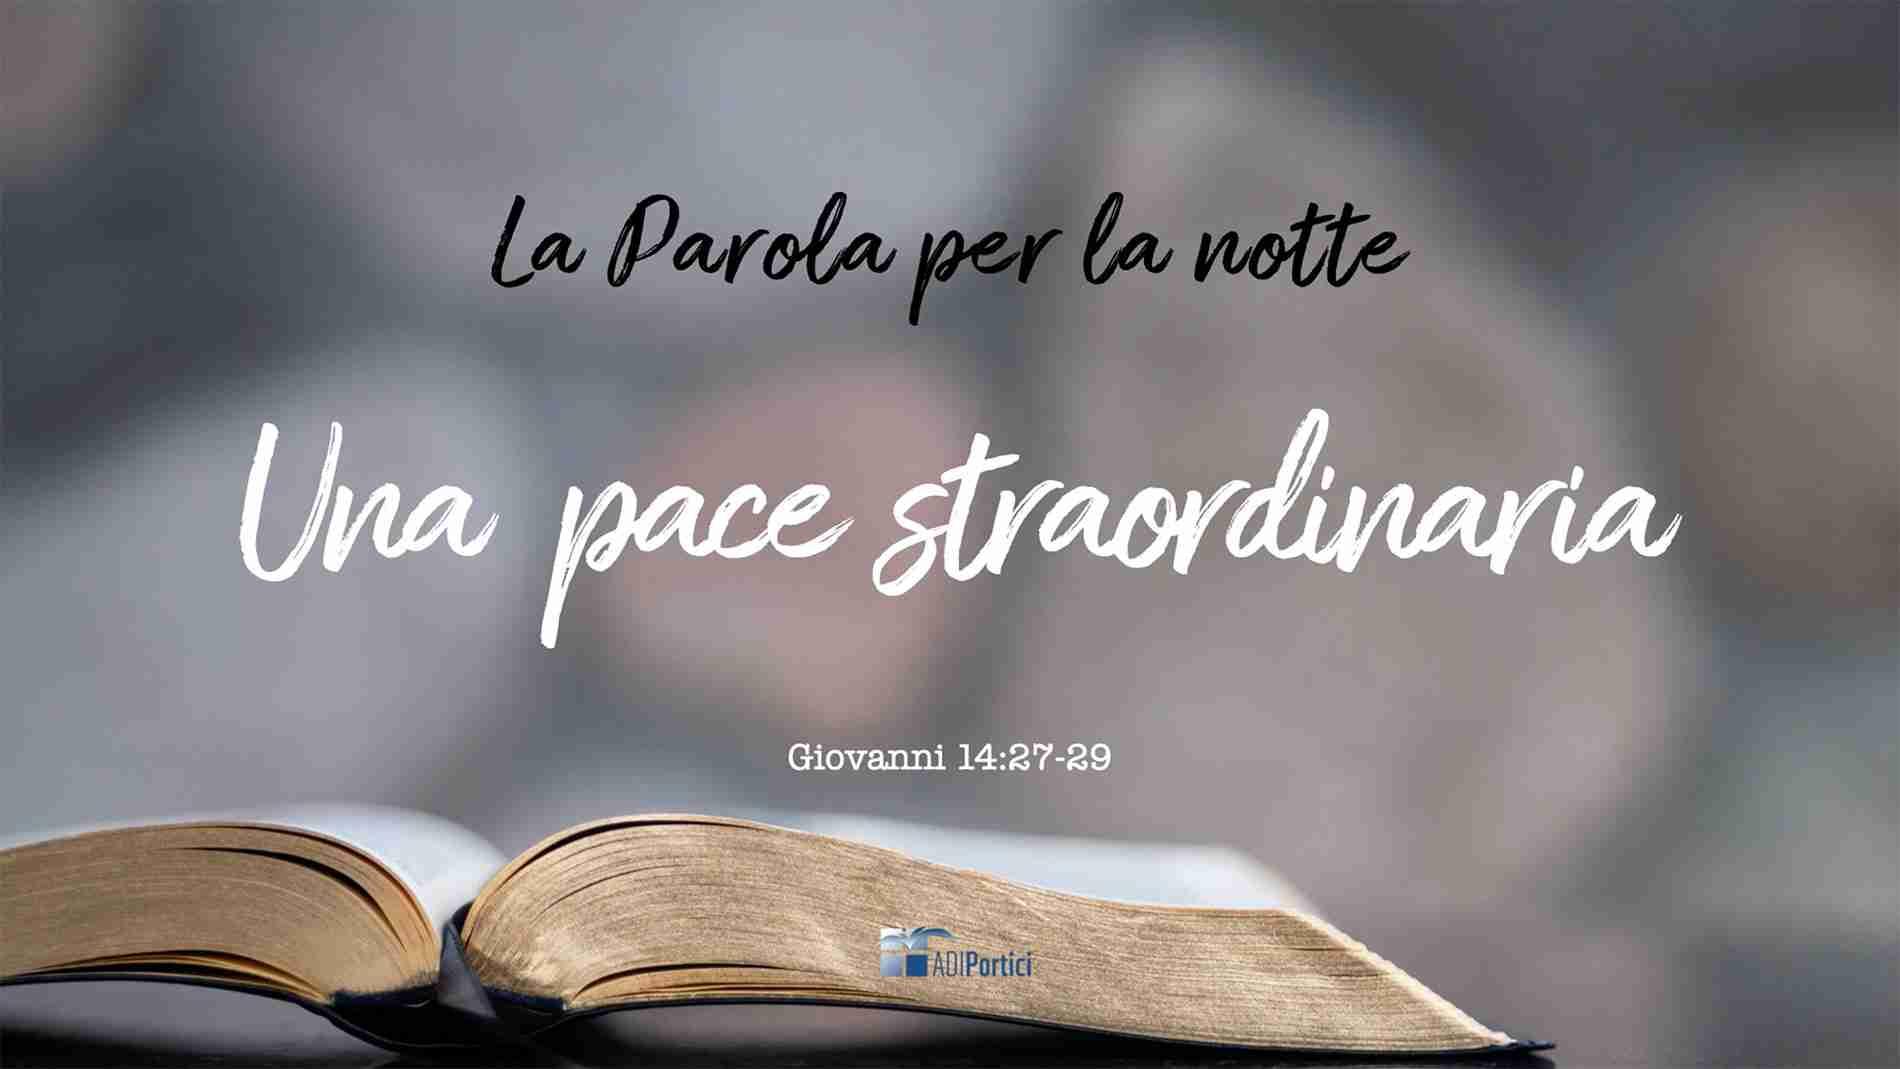 12. Una pace straordinaria